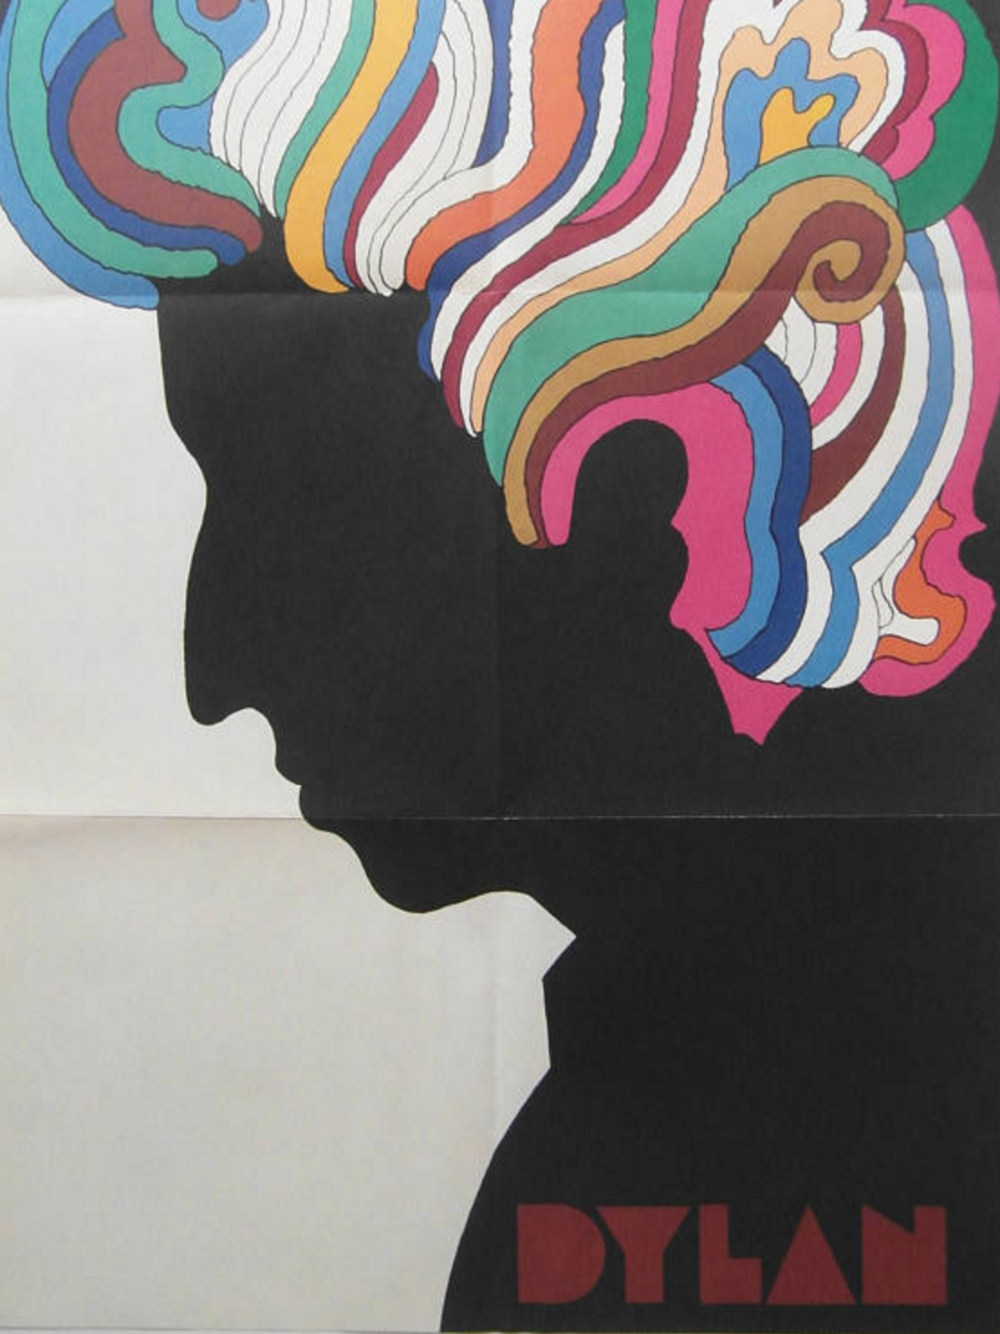 Original 1966 First Printing Bob Dylan Poster by Milton Glaser